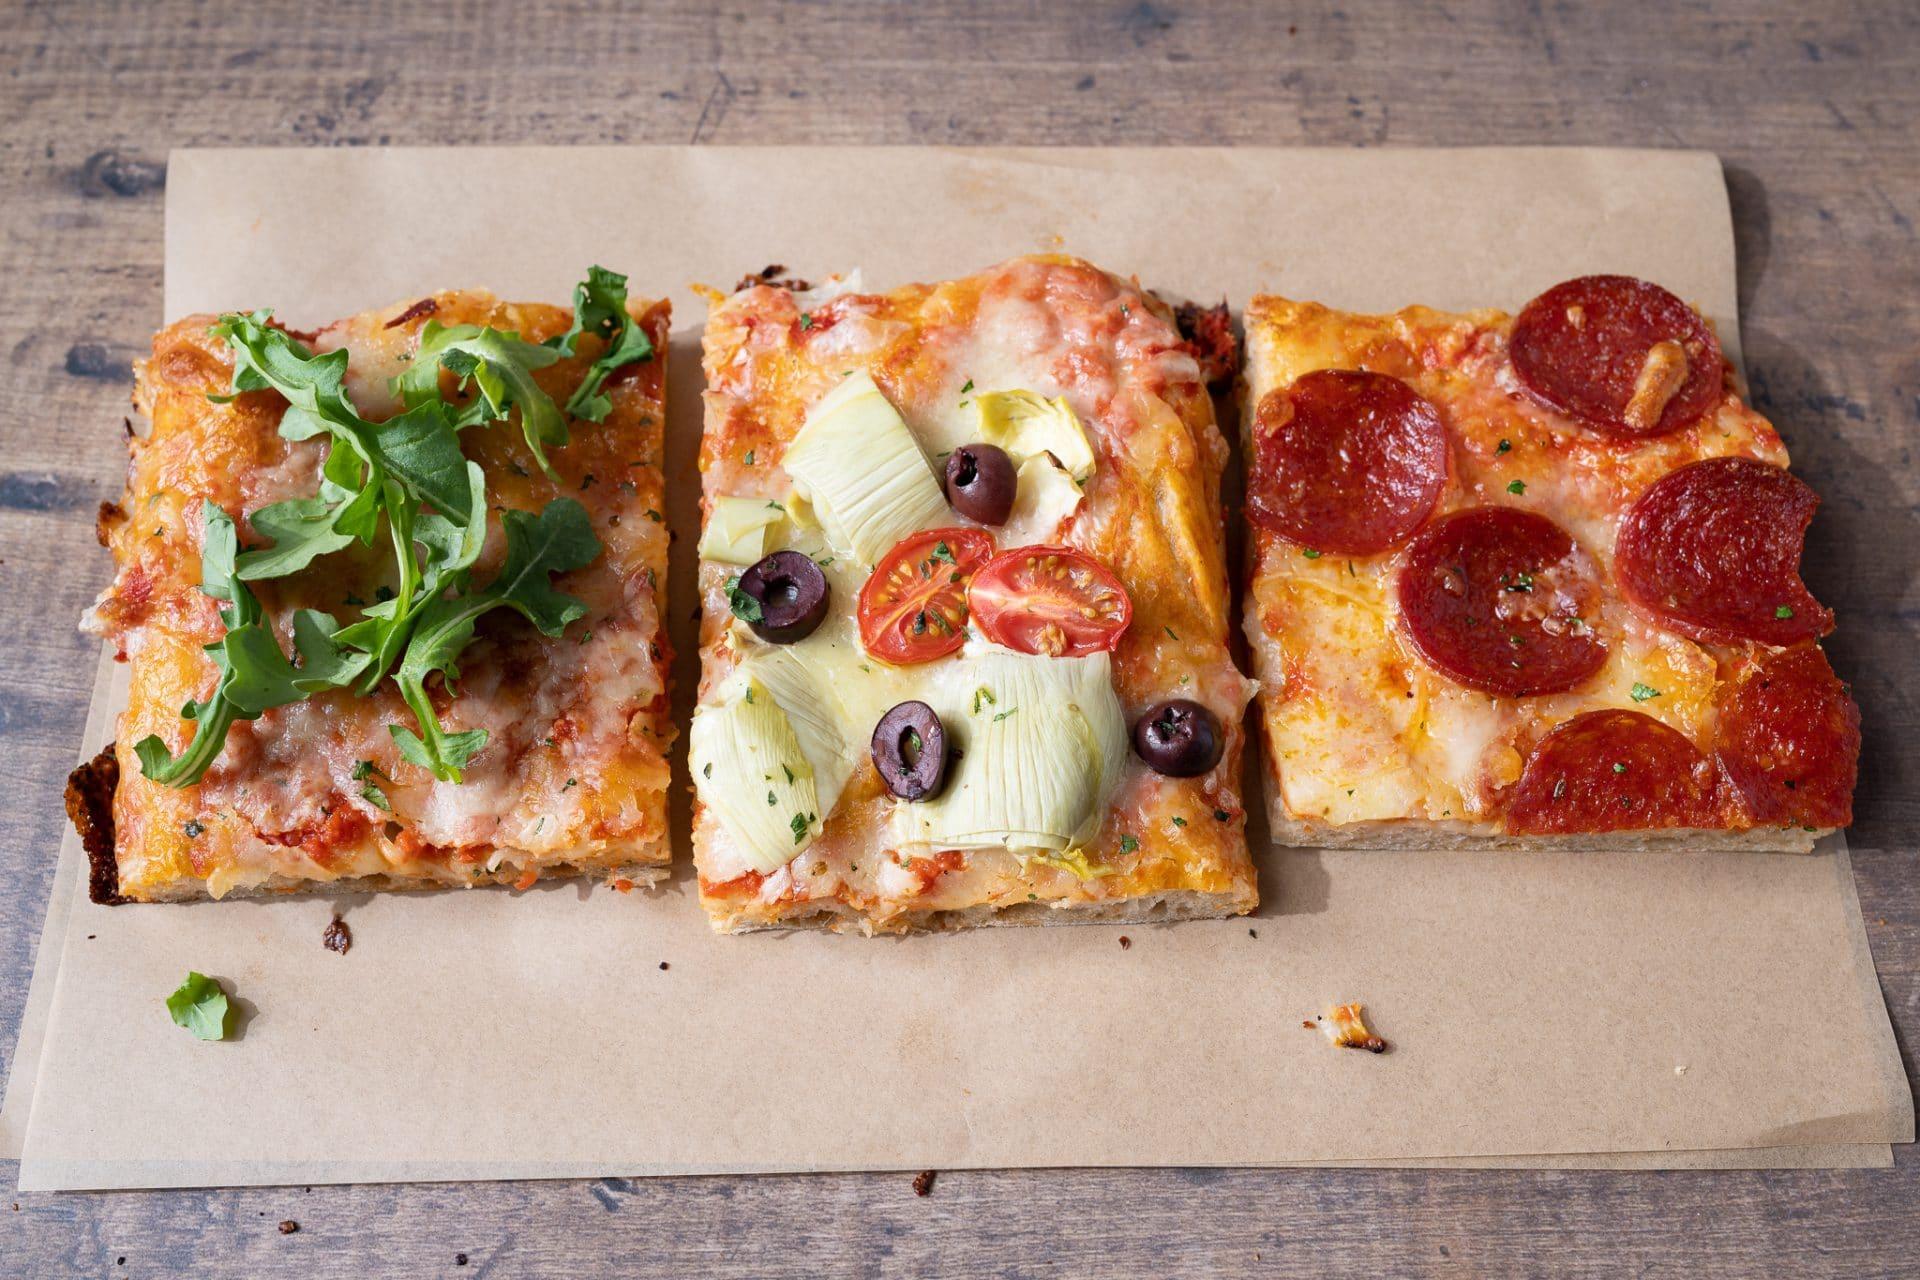 Sourdough rectangular pizza slices